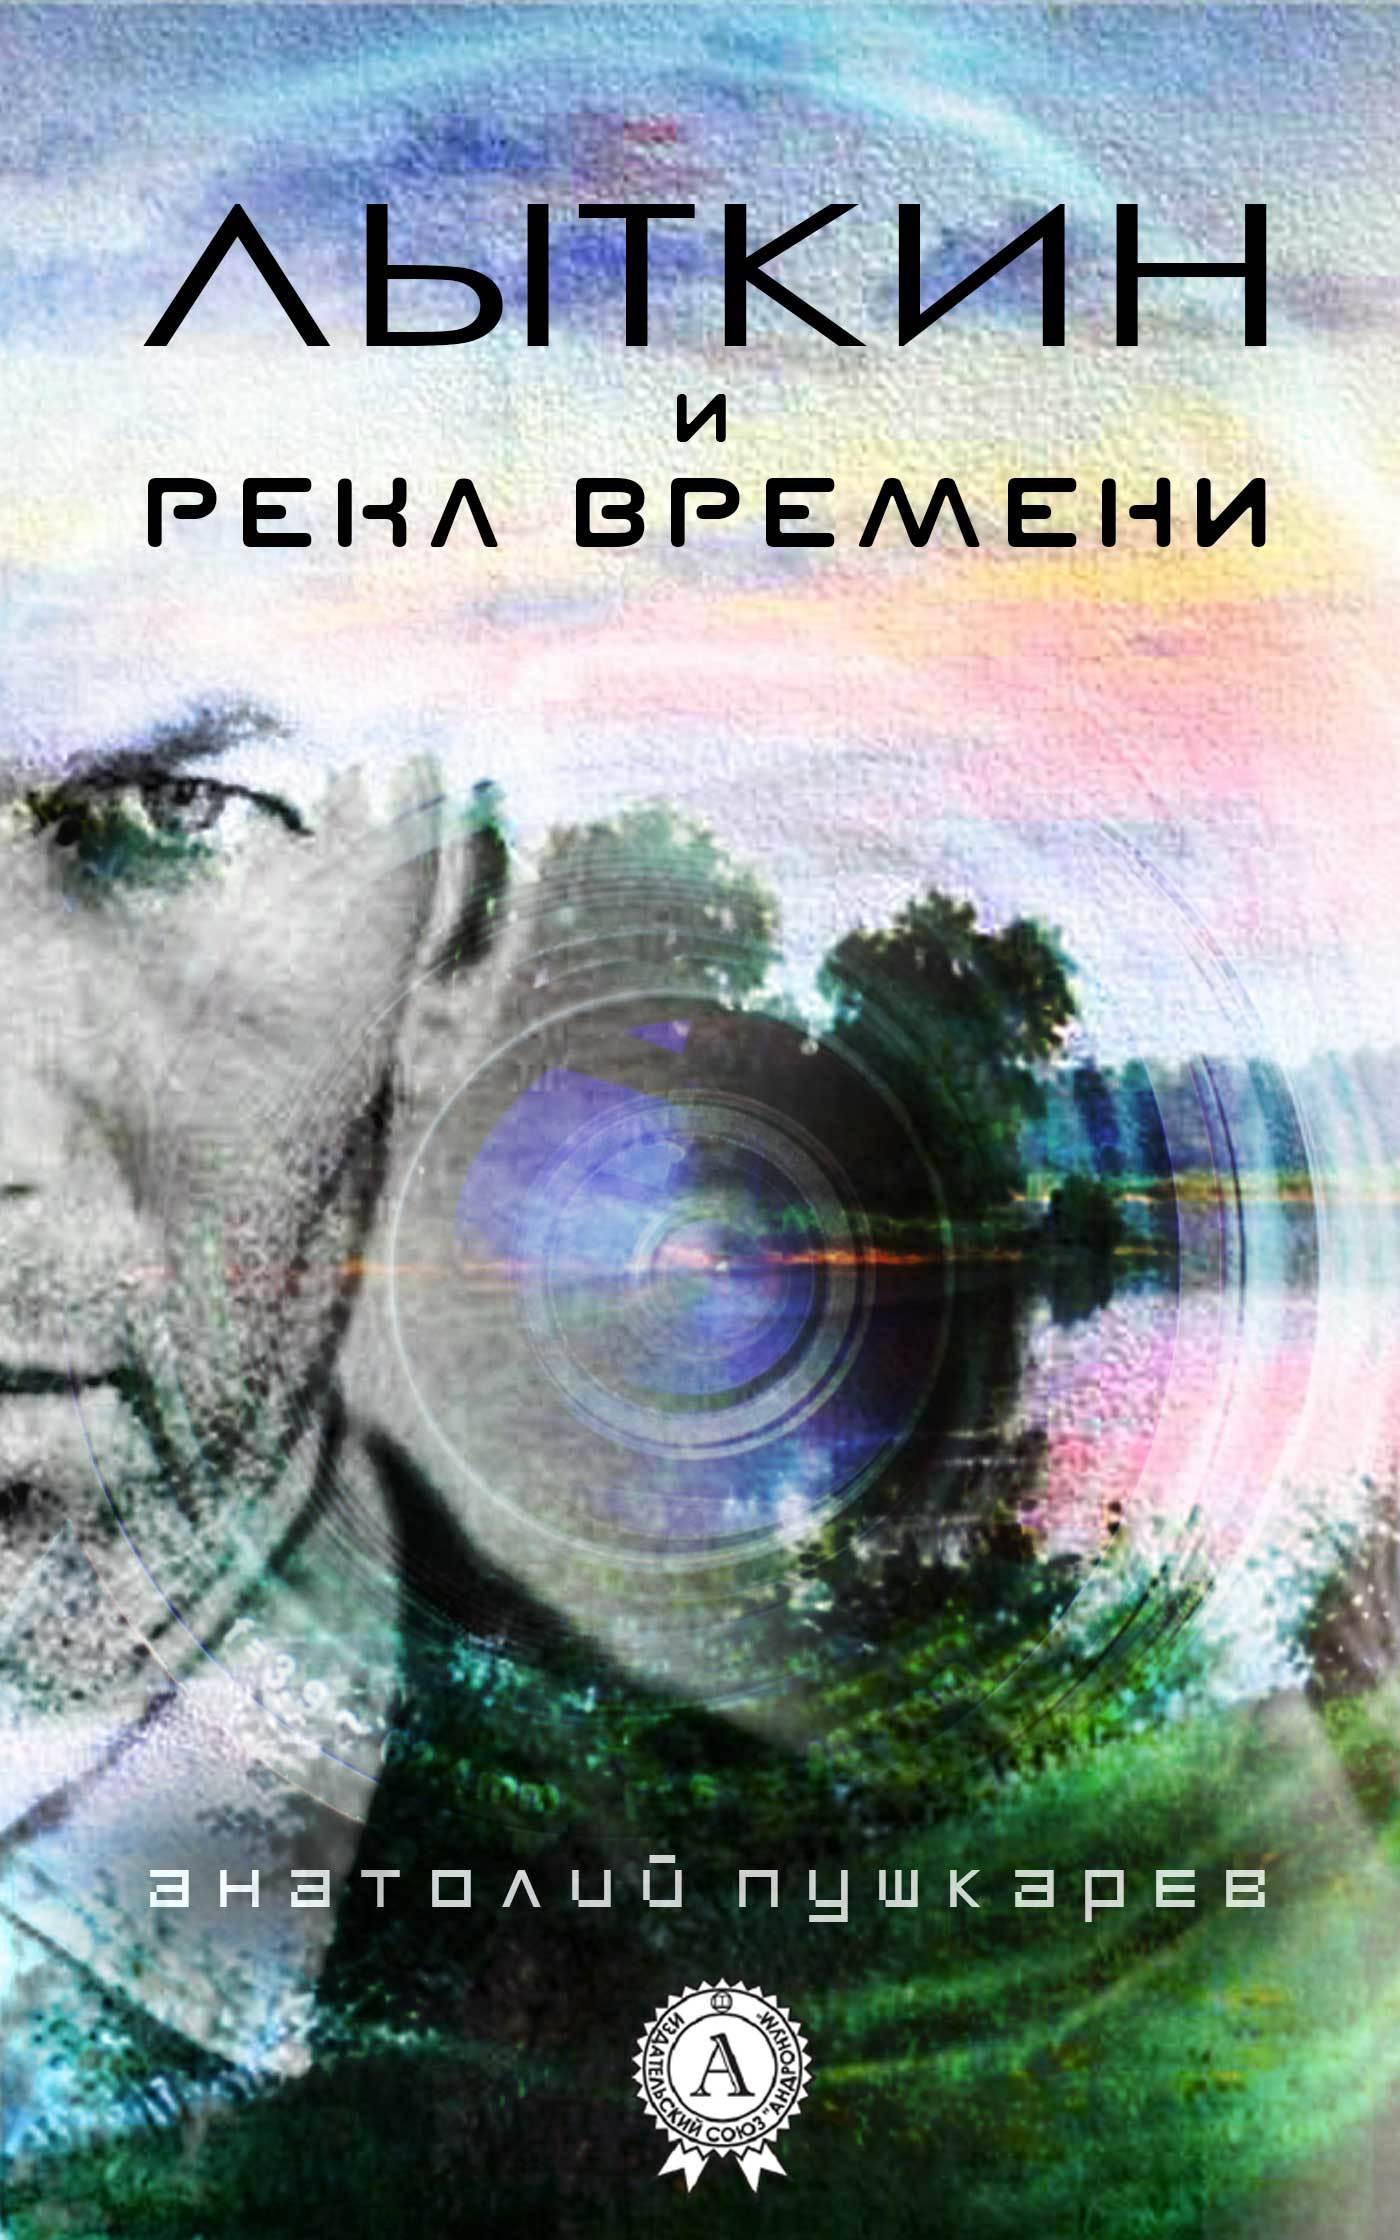 цены Анатолий Пушкарёв Лыткин и река времени